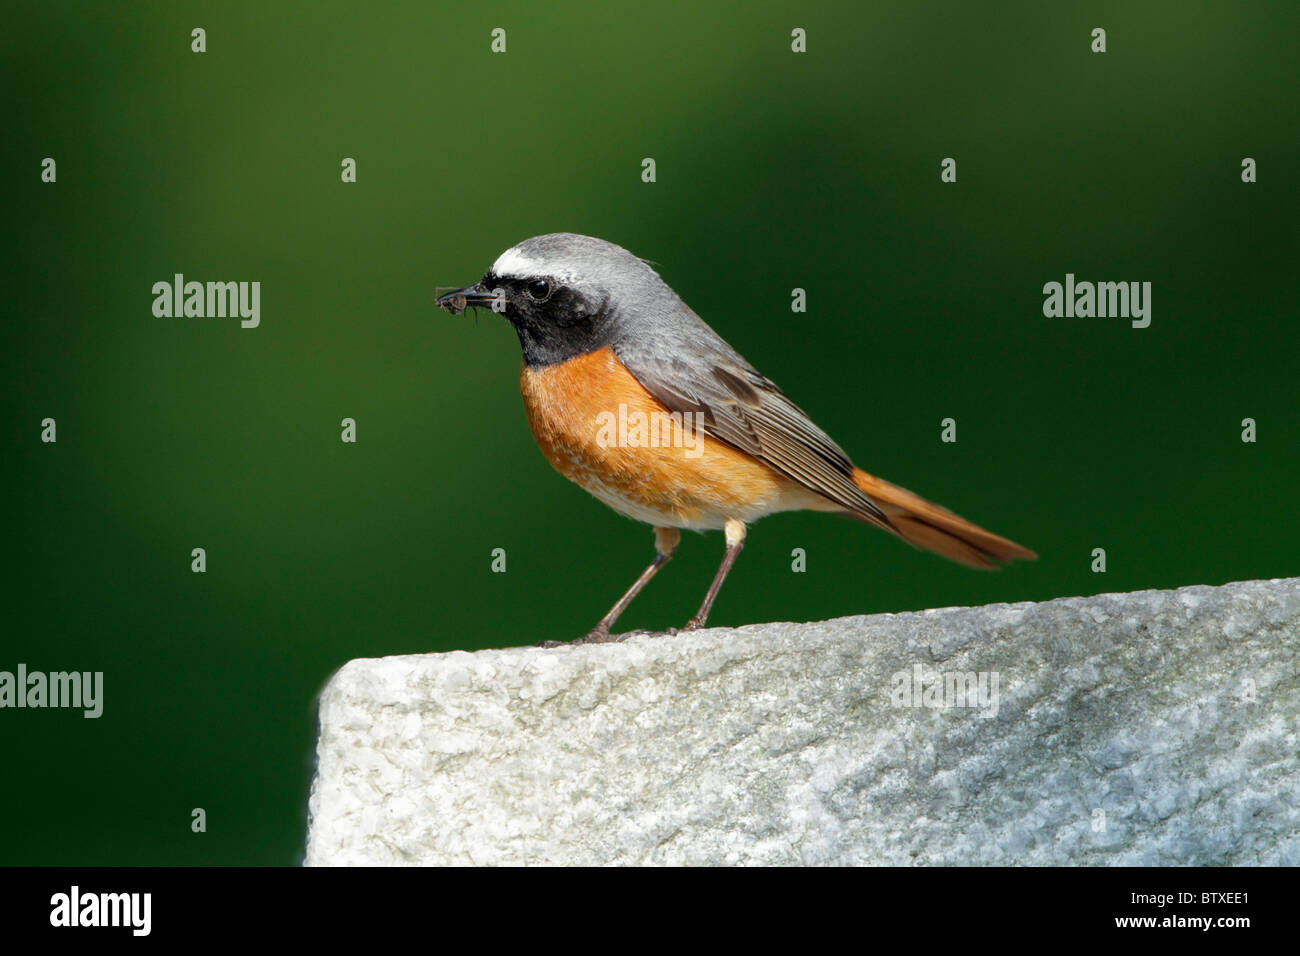 Redstart (Phoenicurus phoenicurus), male perched on gravestone, Germany - Stock Image